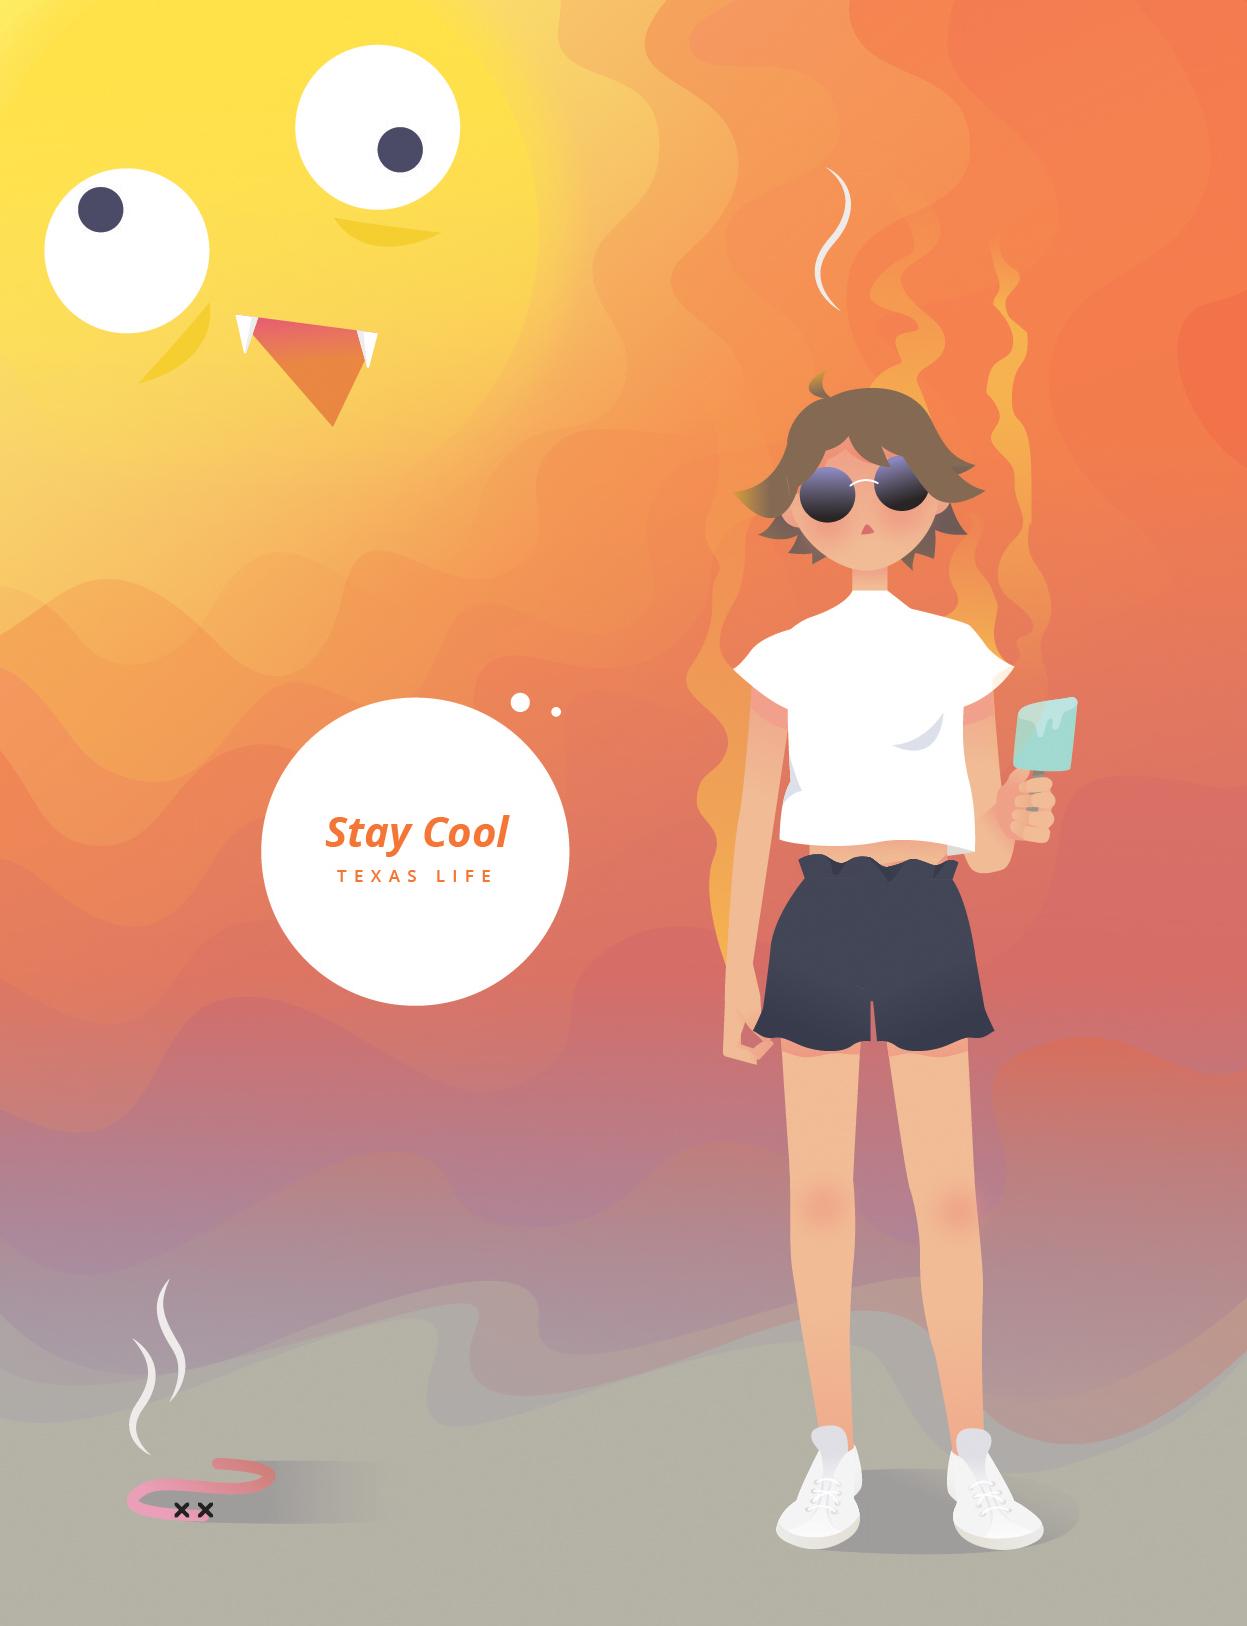 stayCool-01.jpg